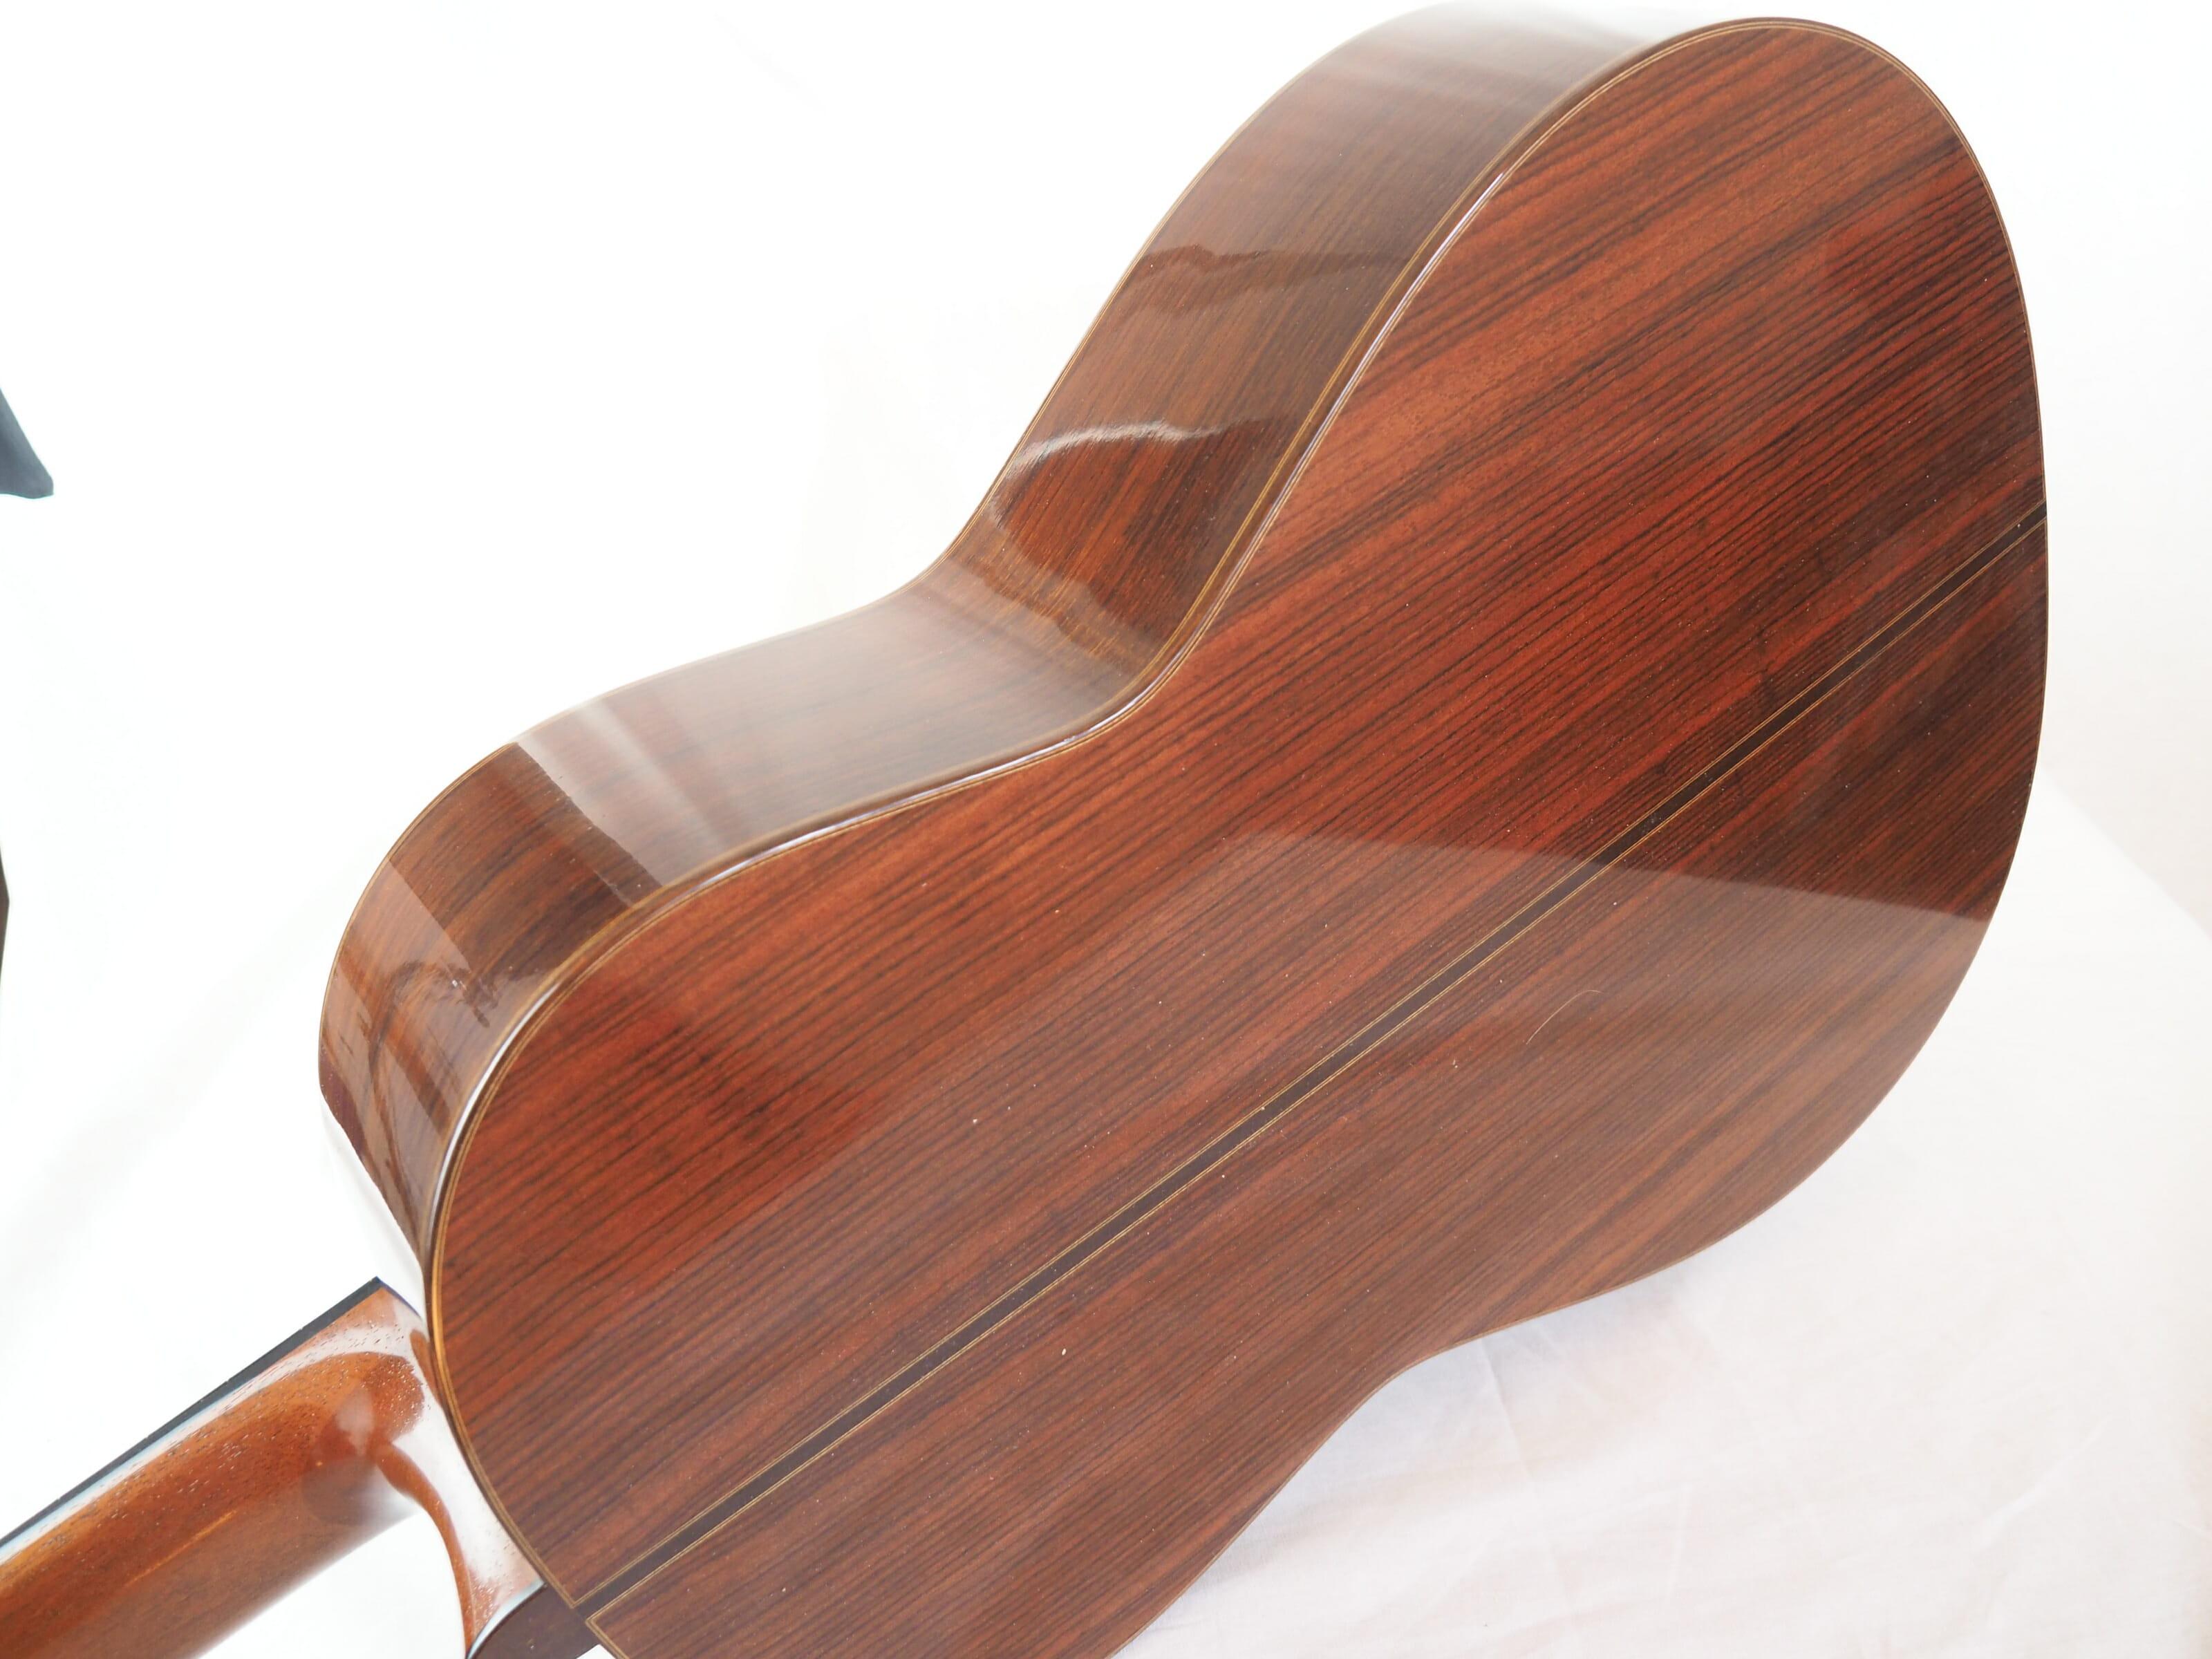 Daniel Friederich luthier guitare classique No 19FRI479-03